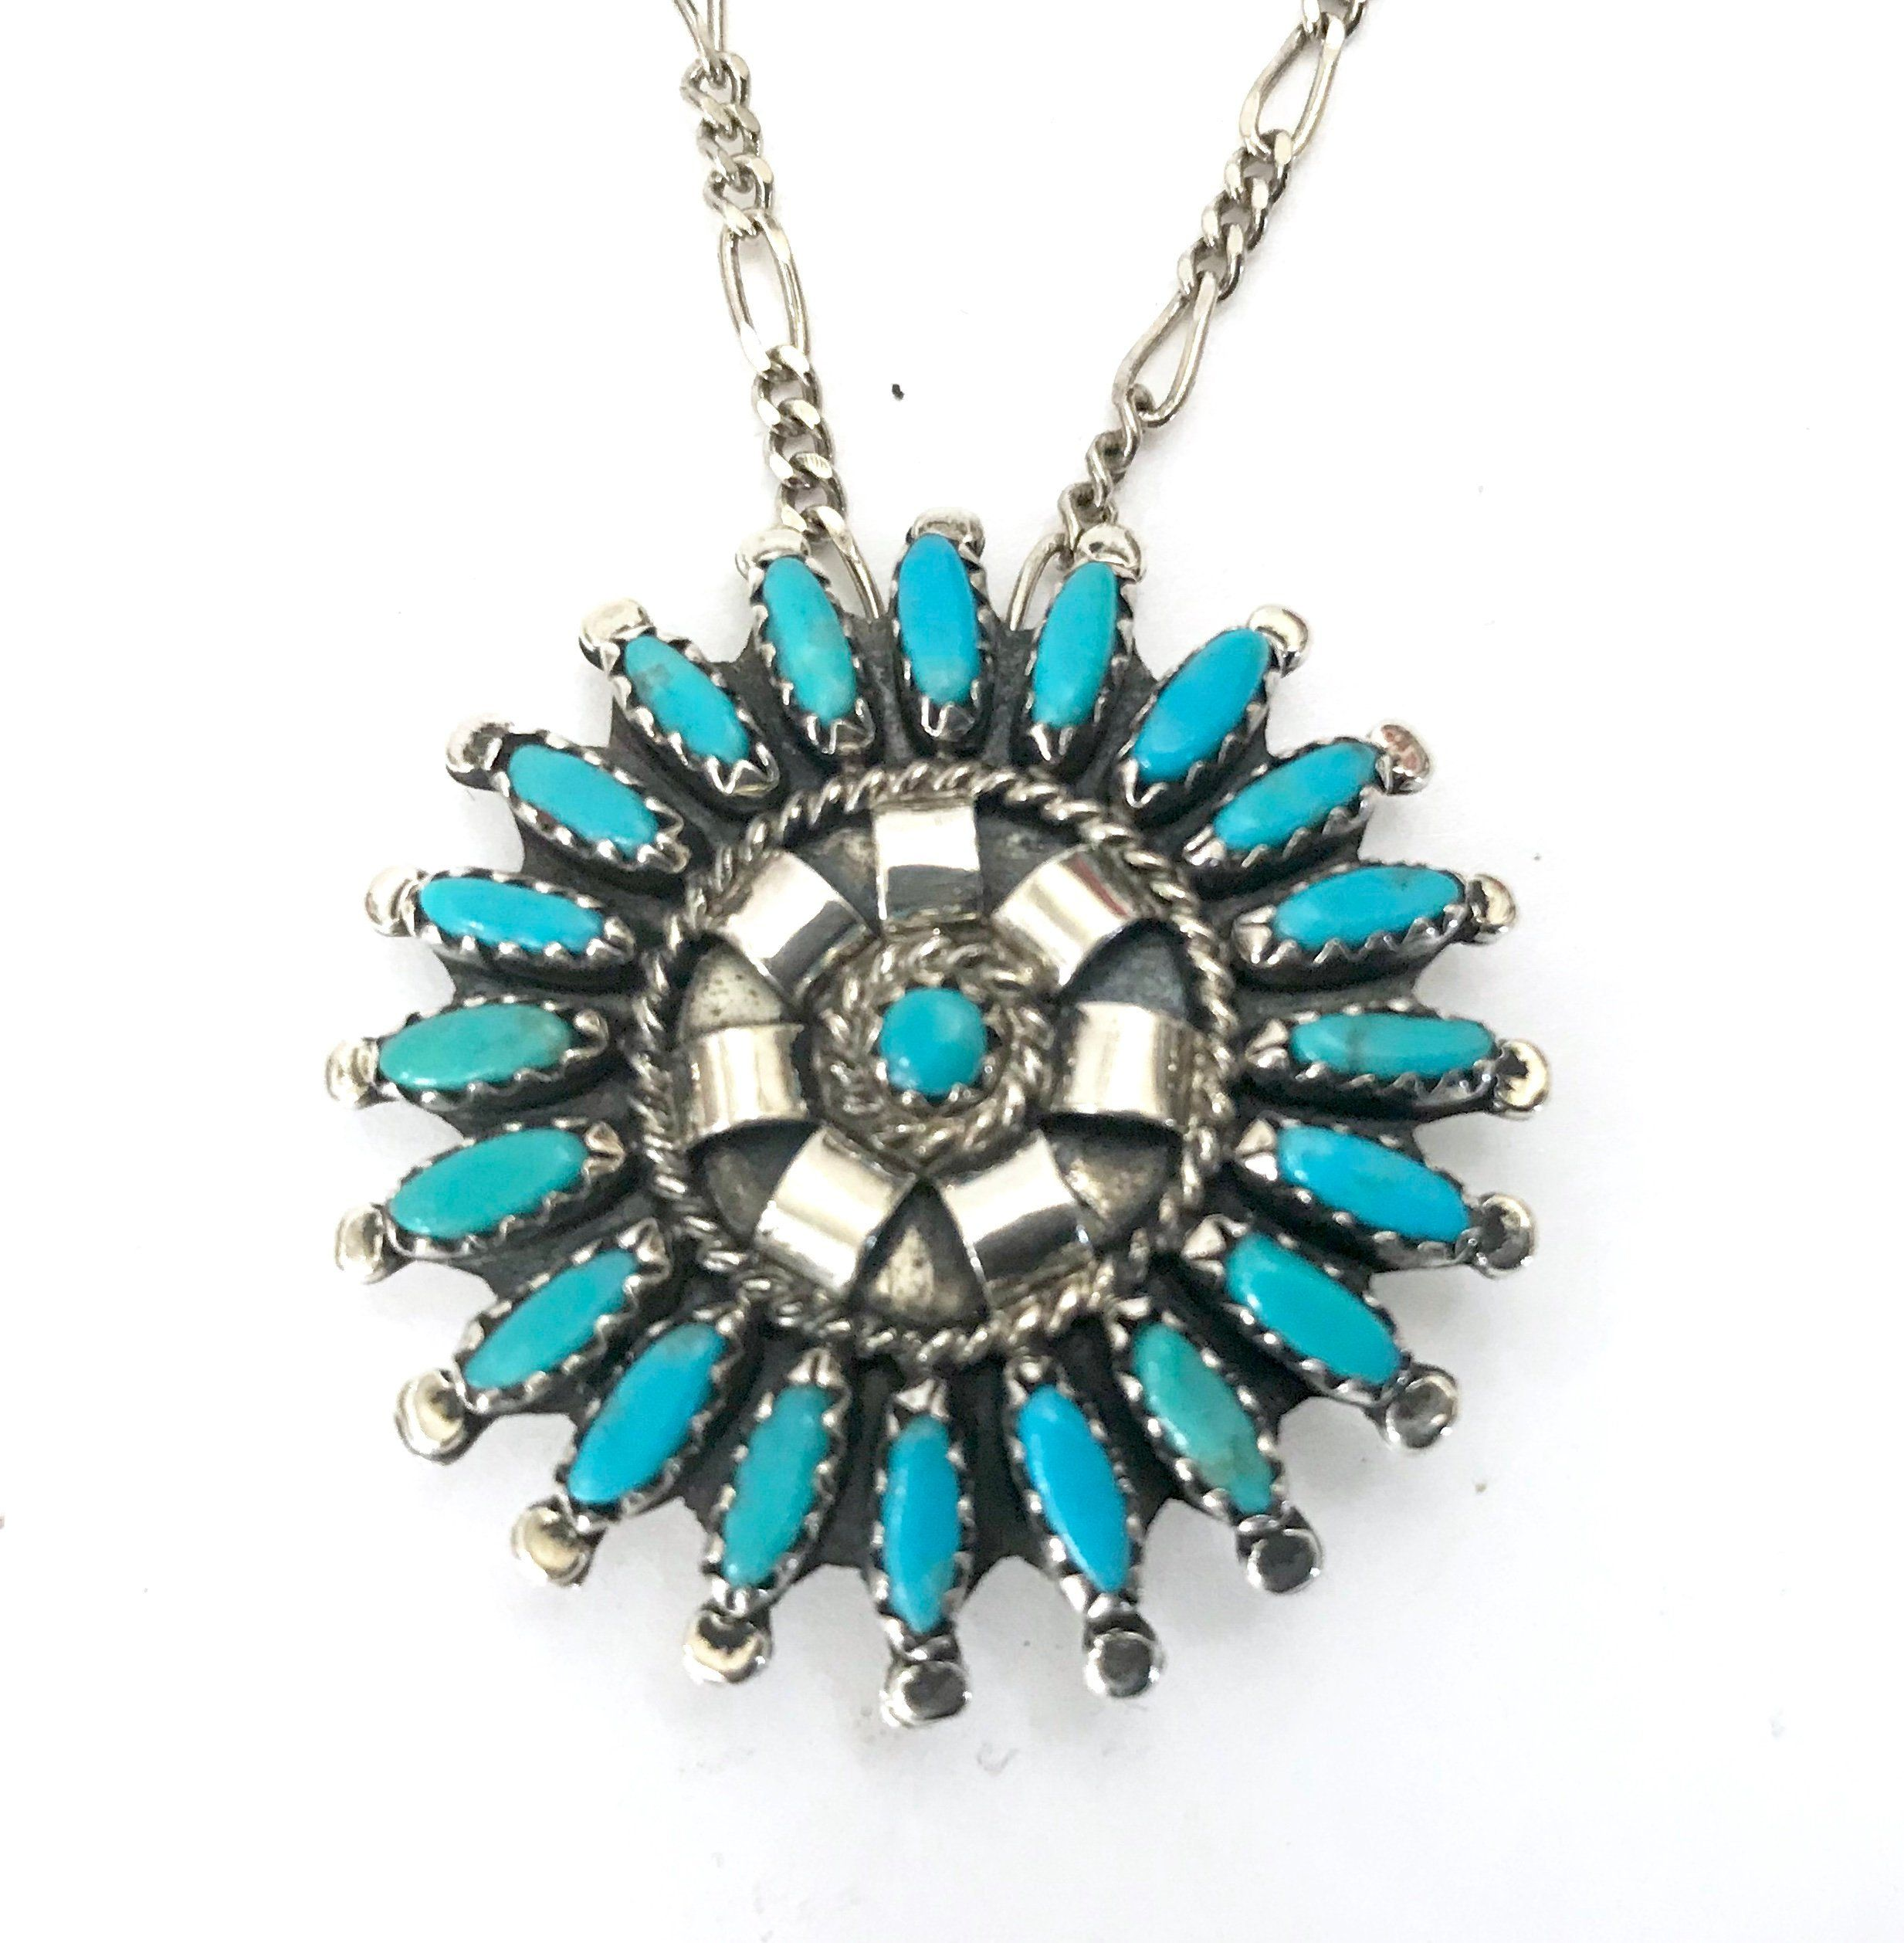 "/""JJ/"" Jonette Jewelry Silver Pewter /'African MASK/' 24/"" Necklace"